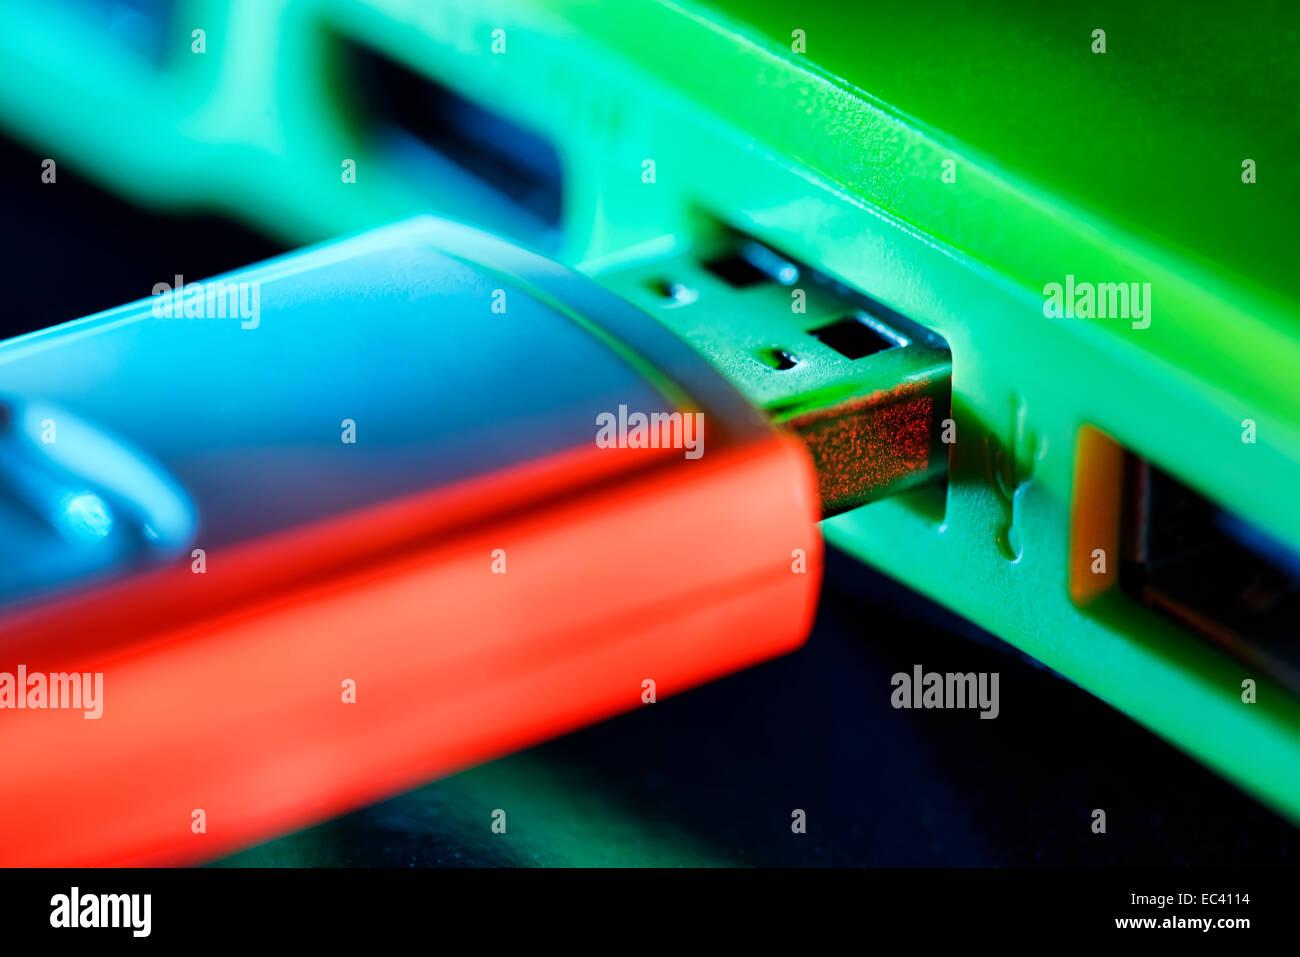 USB flash drive - Stock Image